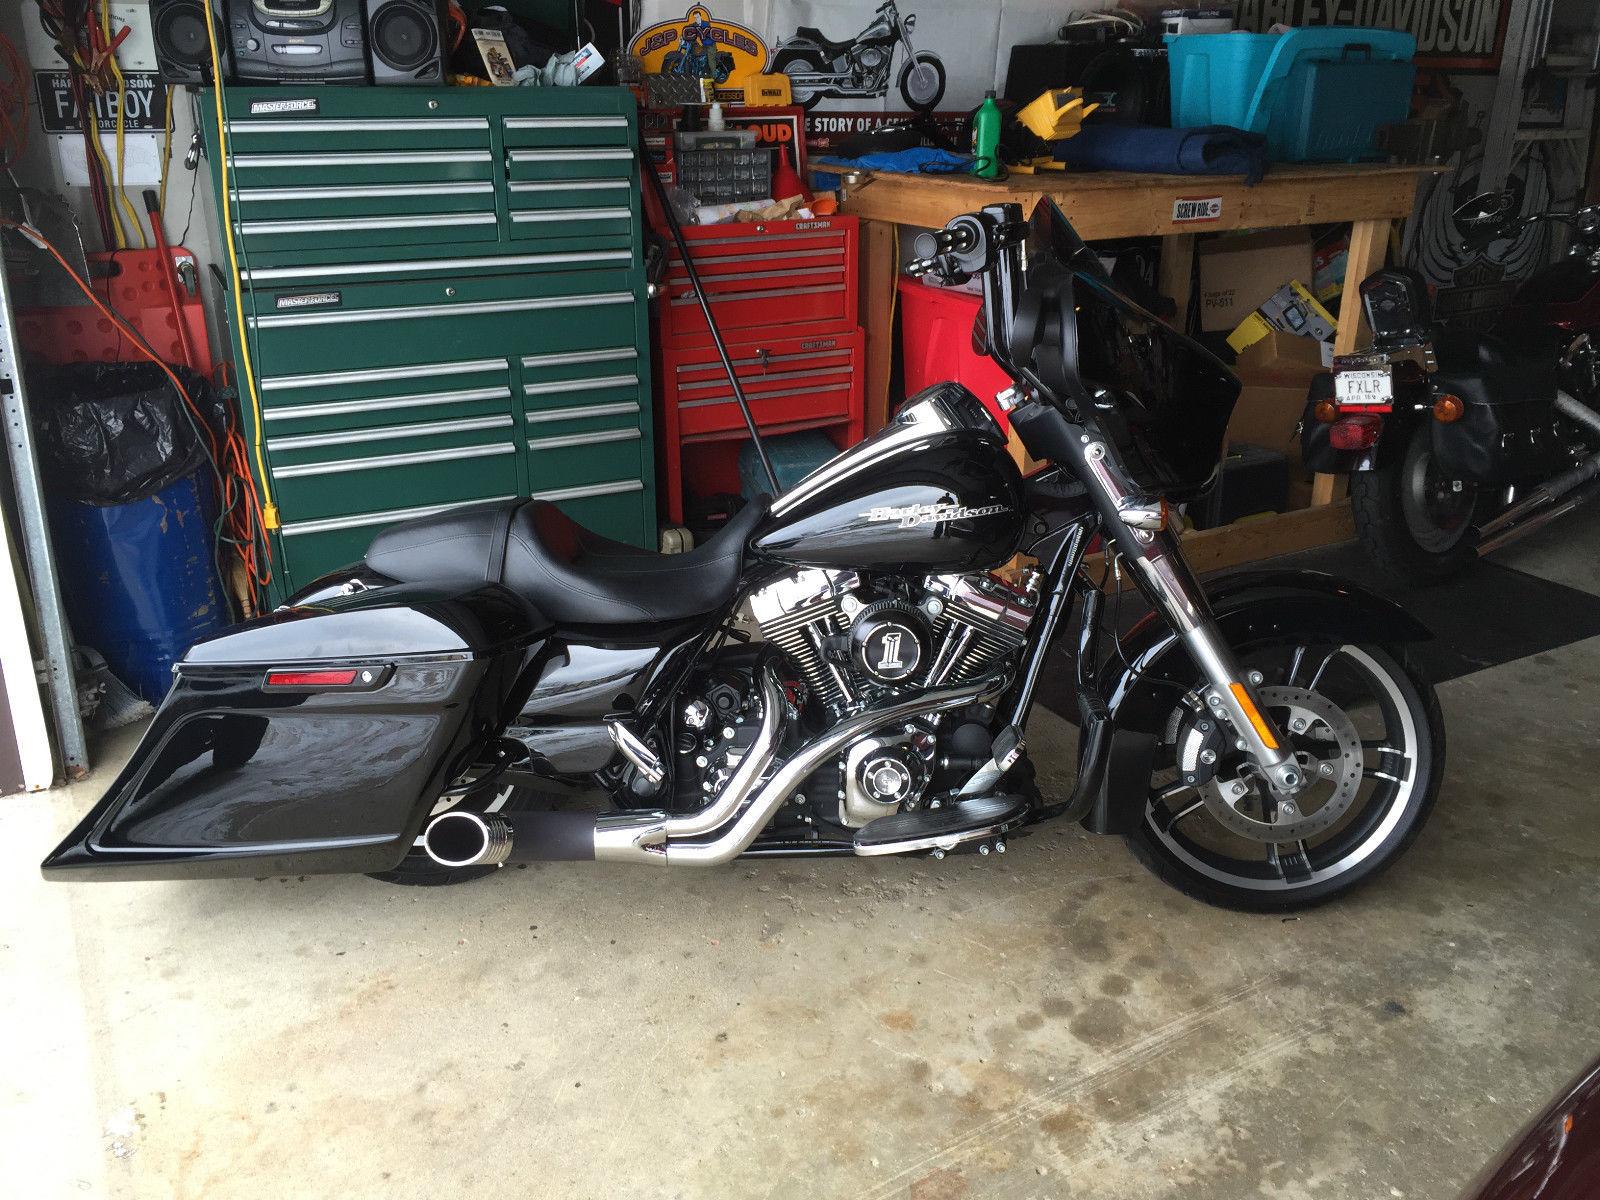 2014 harley davidson custom street glide flhx 2014 Harley Motorcycles 2015 flhx service manual